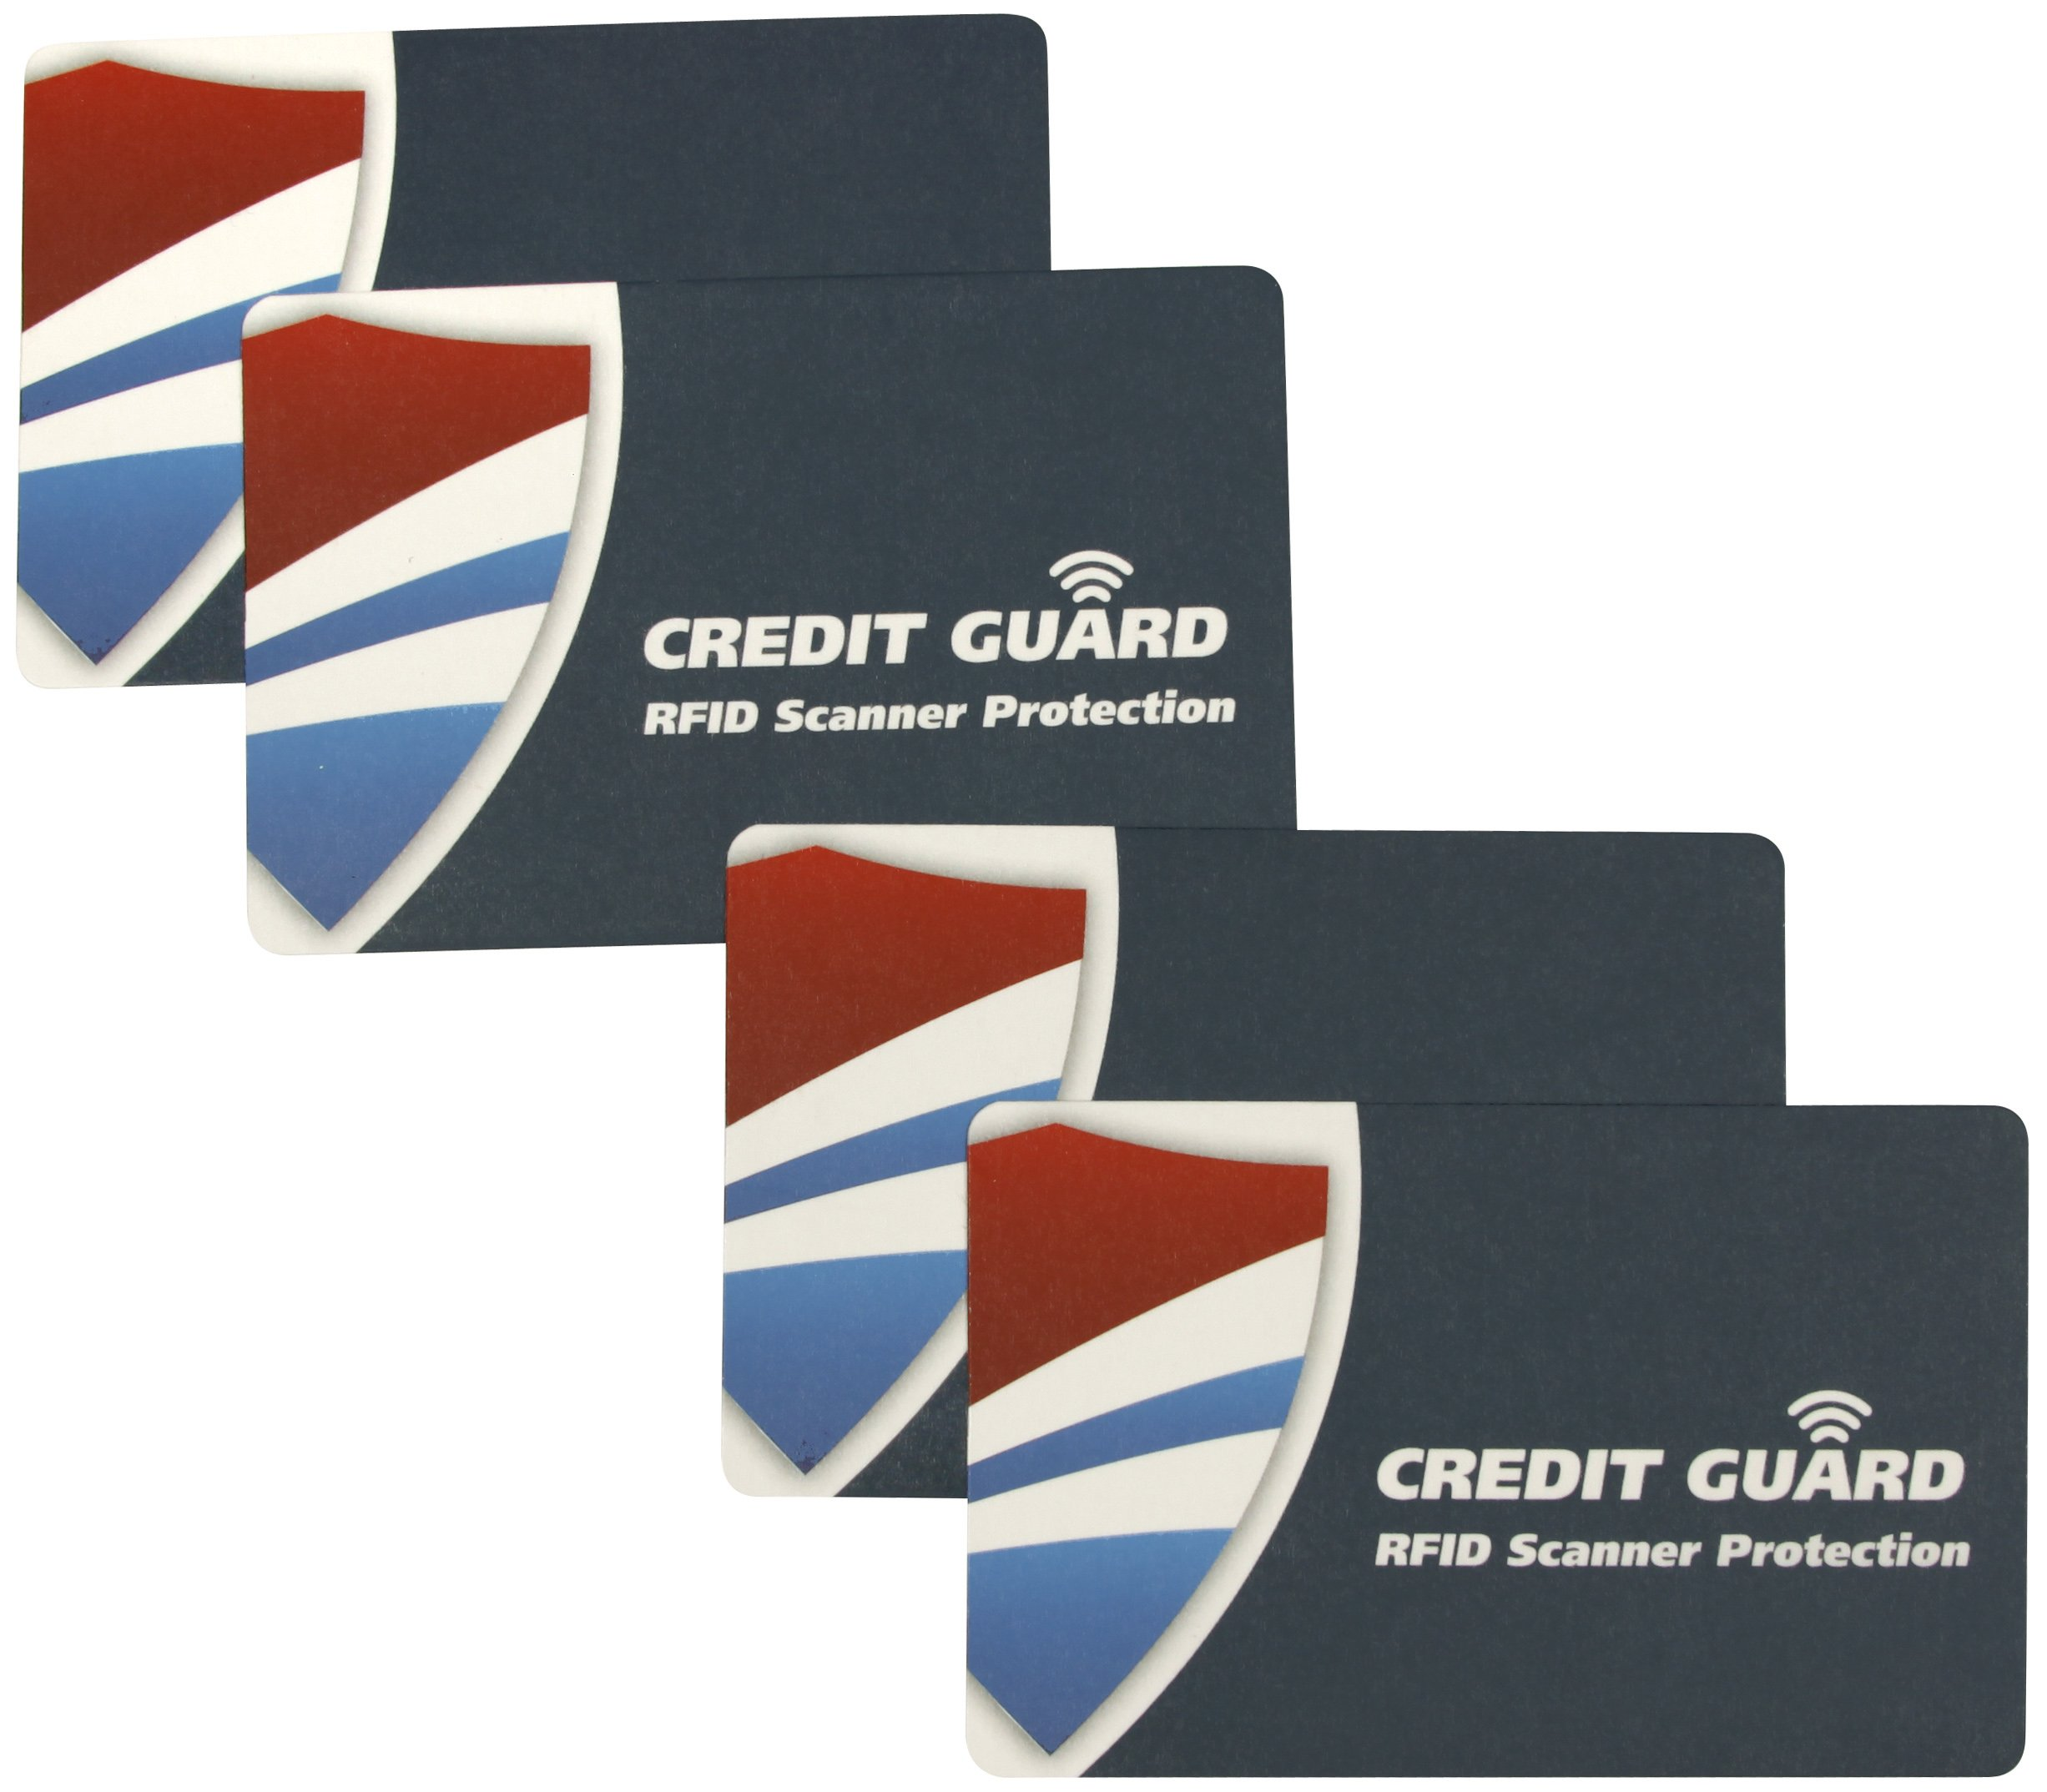 Credit Guard RFID Scanner Blocking Cards, Set of 4